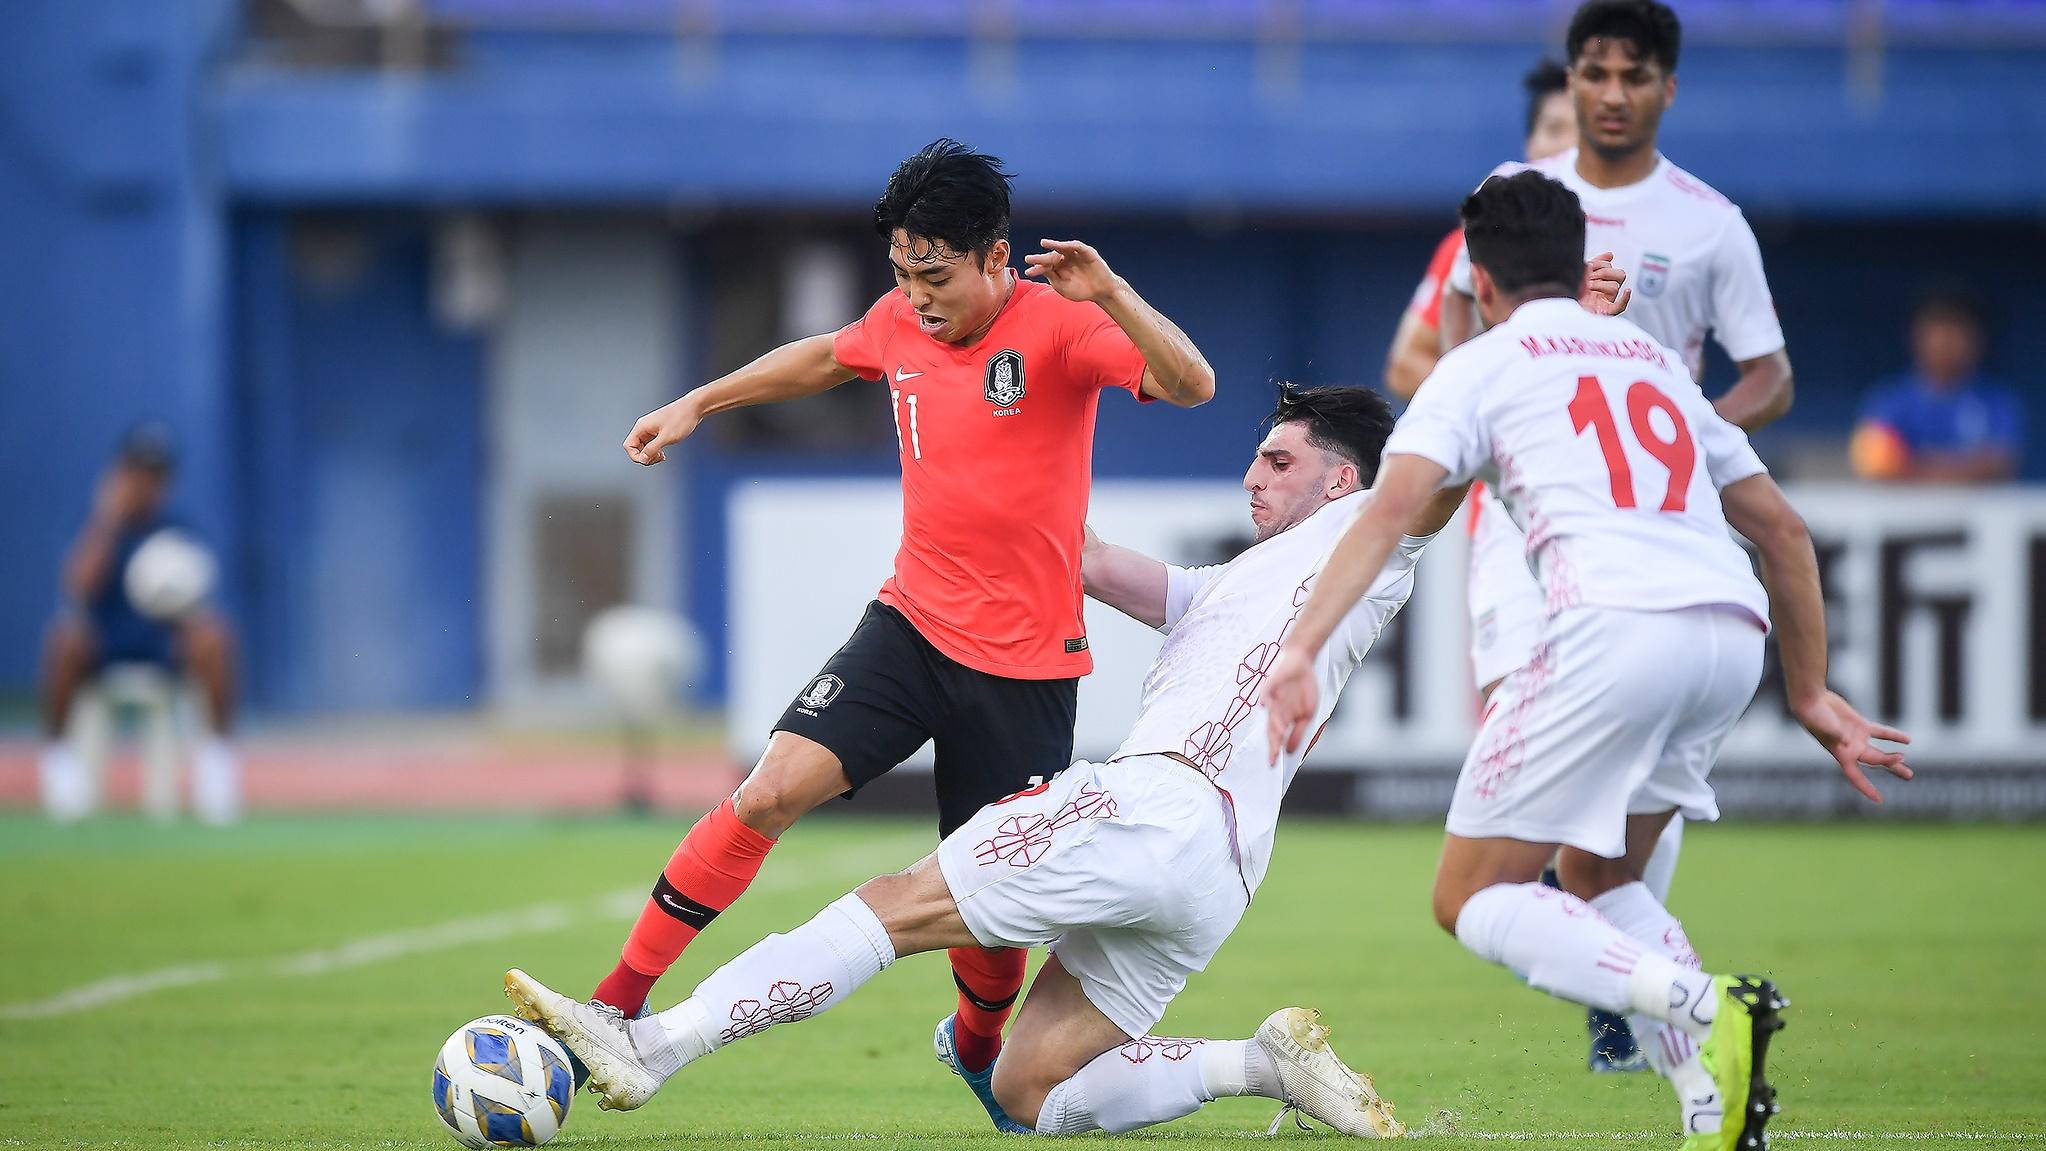 Soi kèo U23 Trung Quốc vs U23 Iran